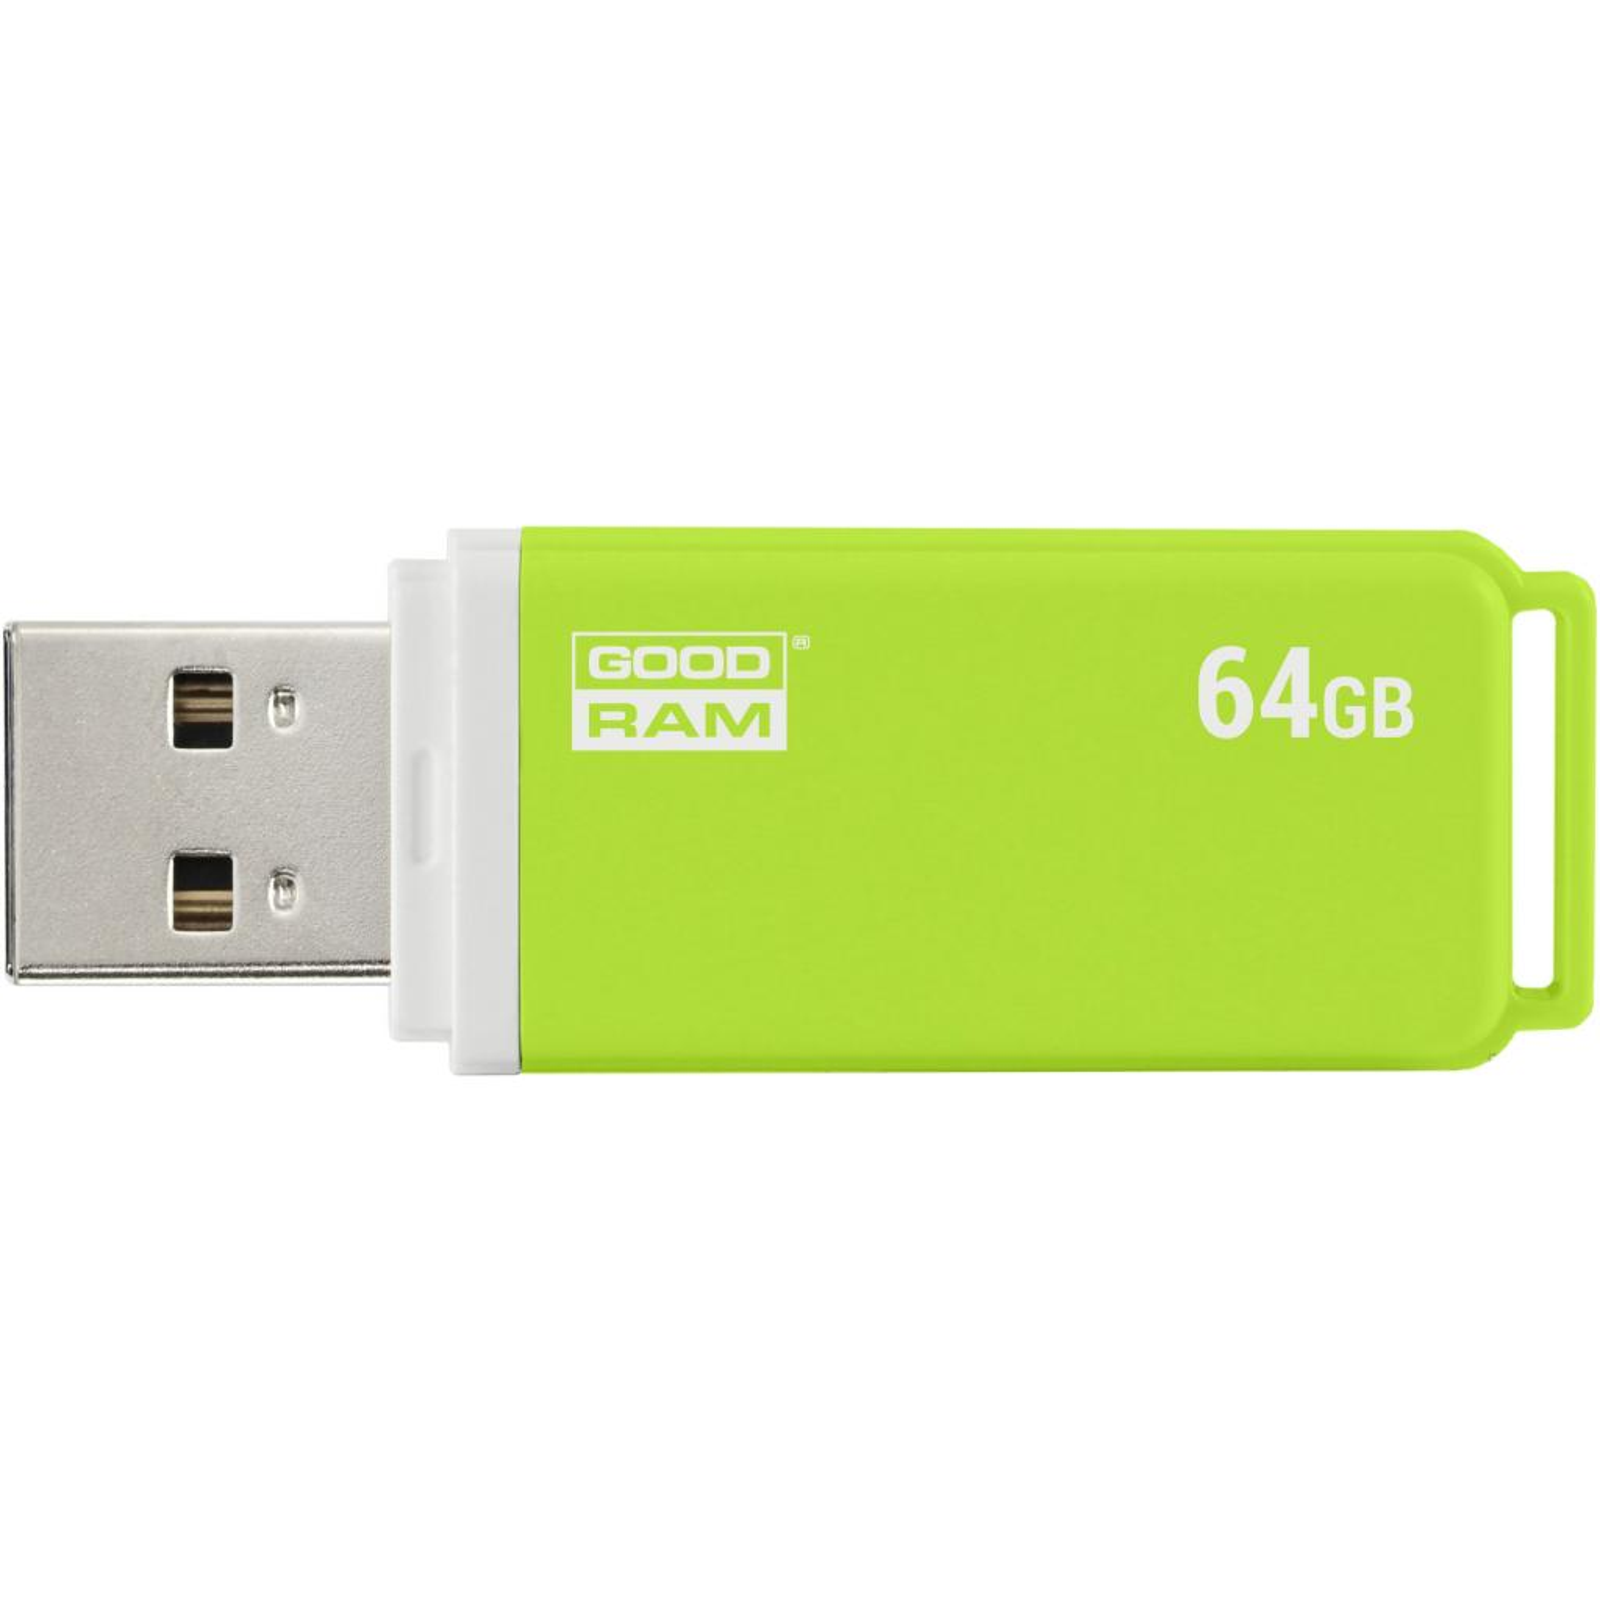 USB флеш накопитель Goodram 8GB UMO2 Green USB 2.0 (UMO2-0080G0R11) изображение 4